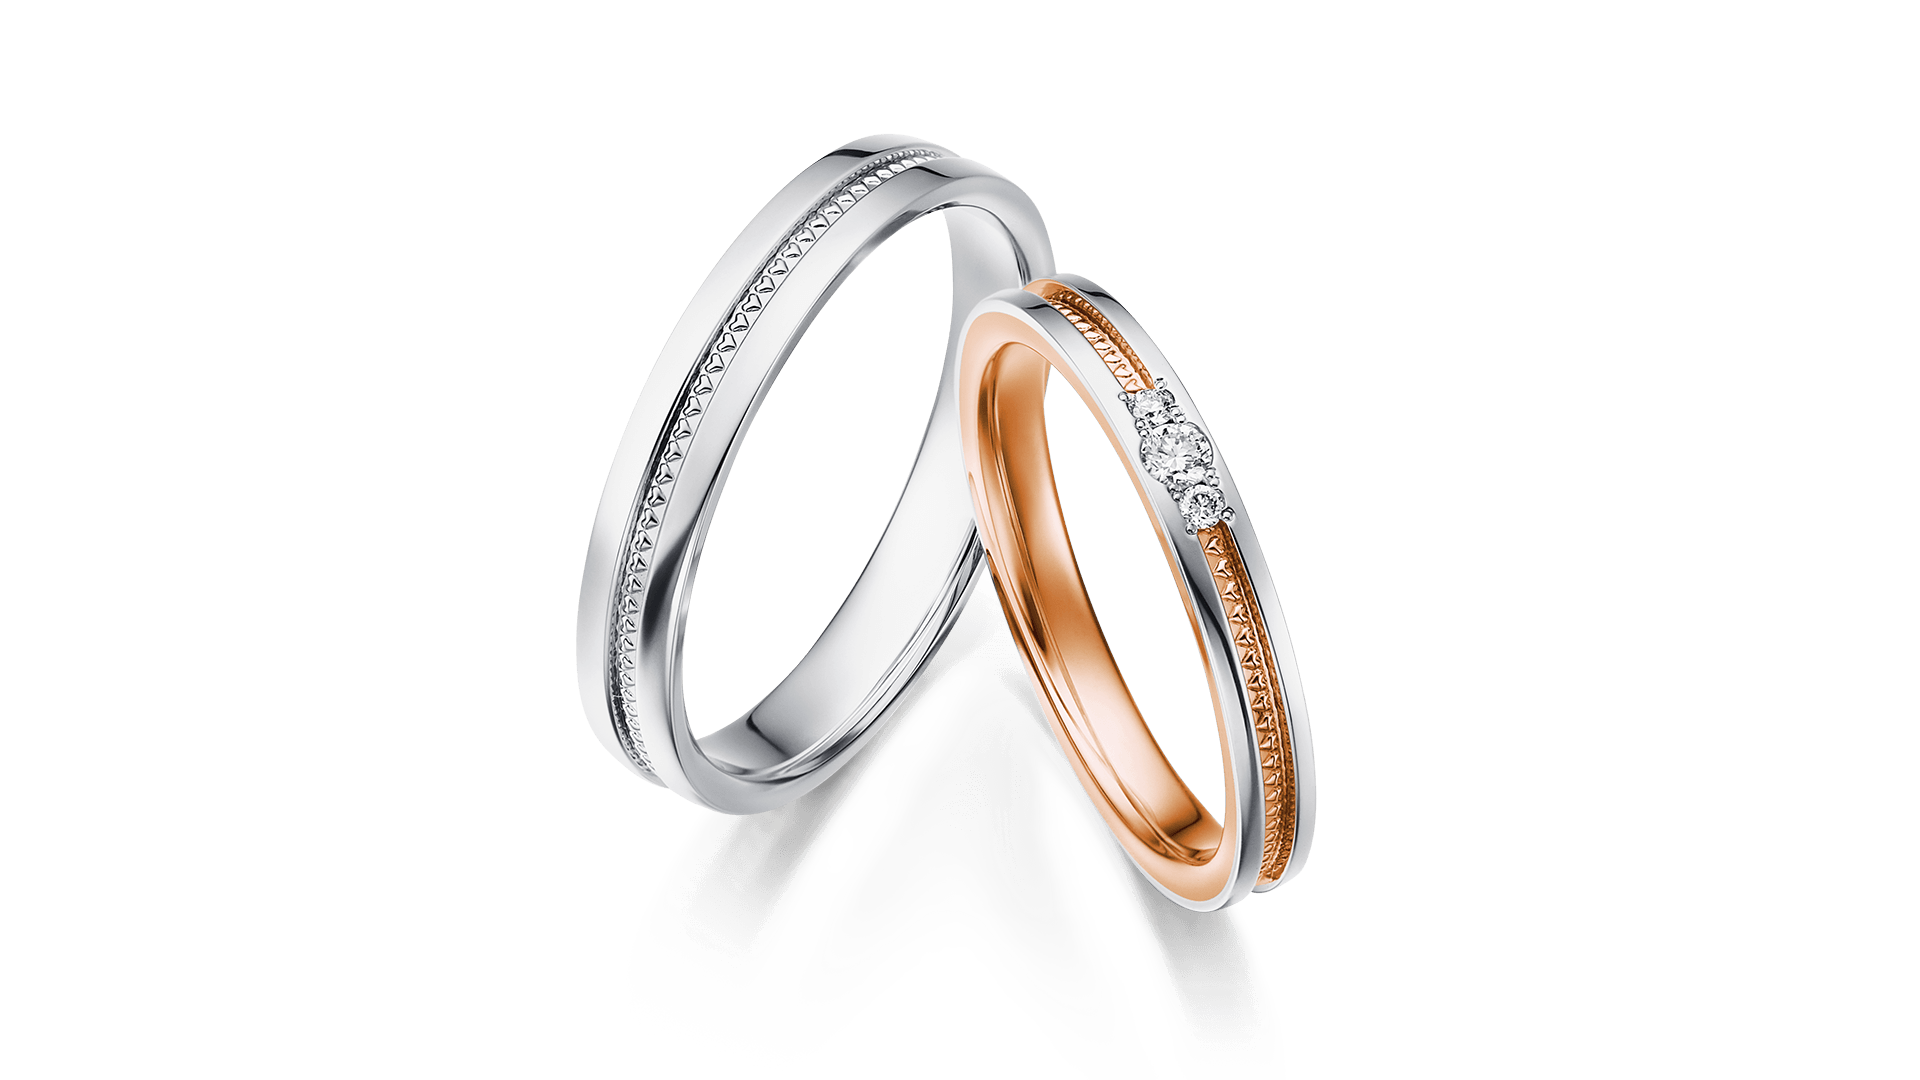 dione ディオーネ   結婚指輪サムネイル 2